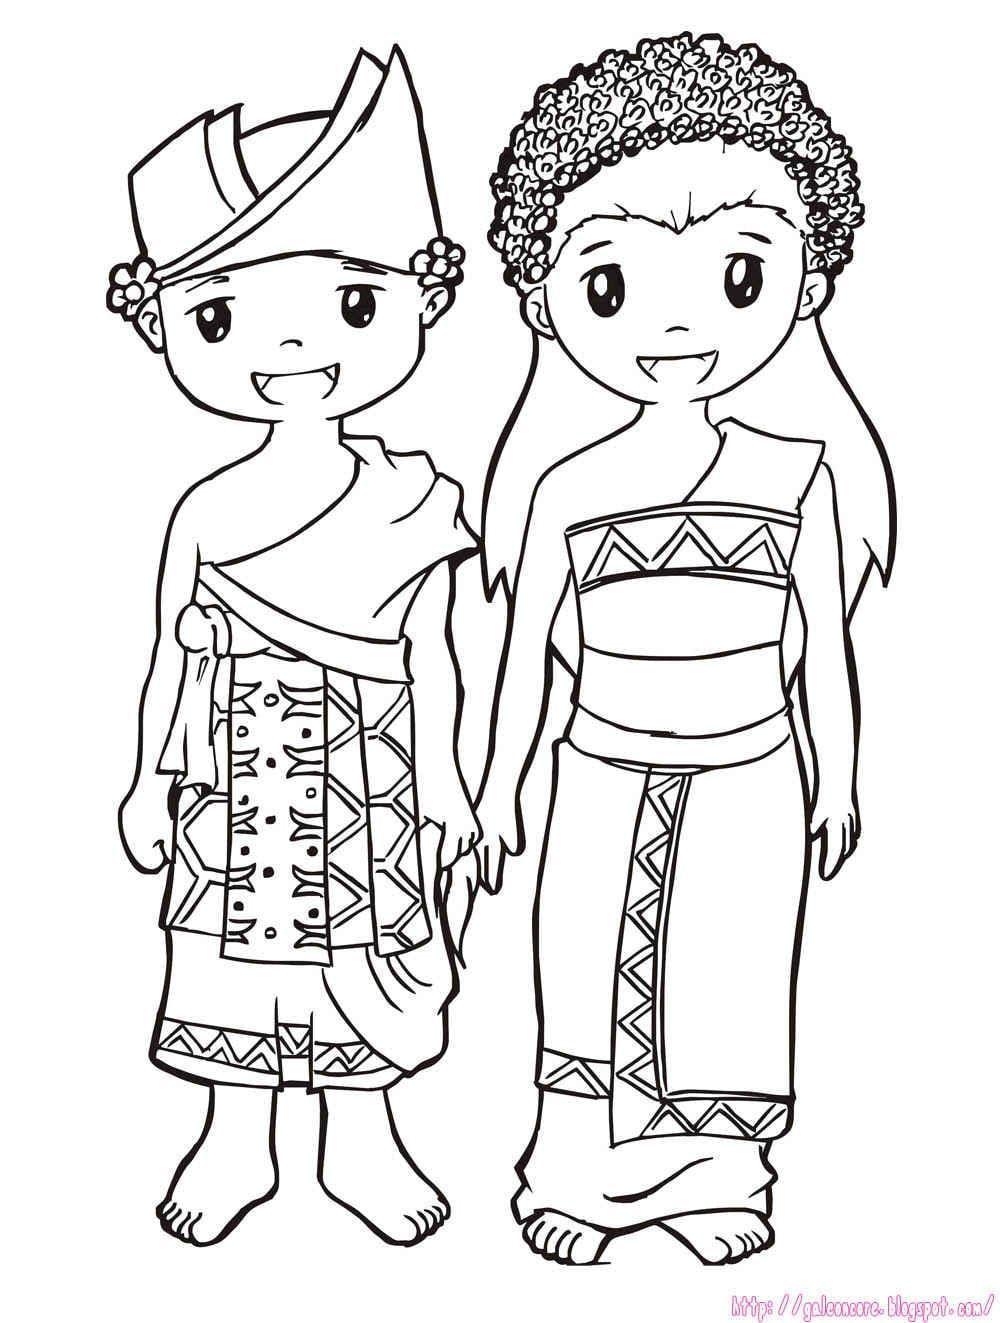 Gambar Pakaian Adat Kartun